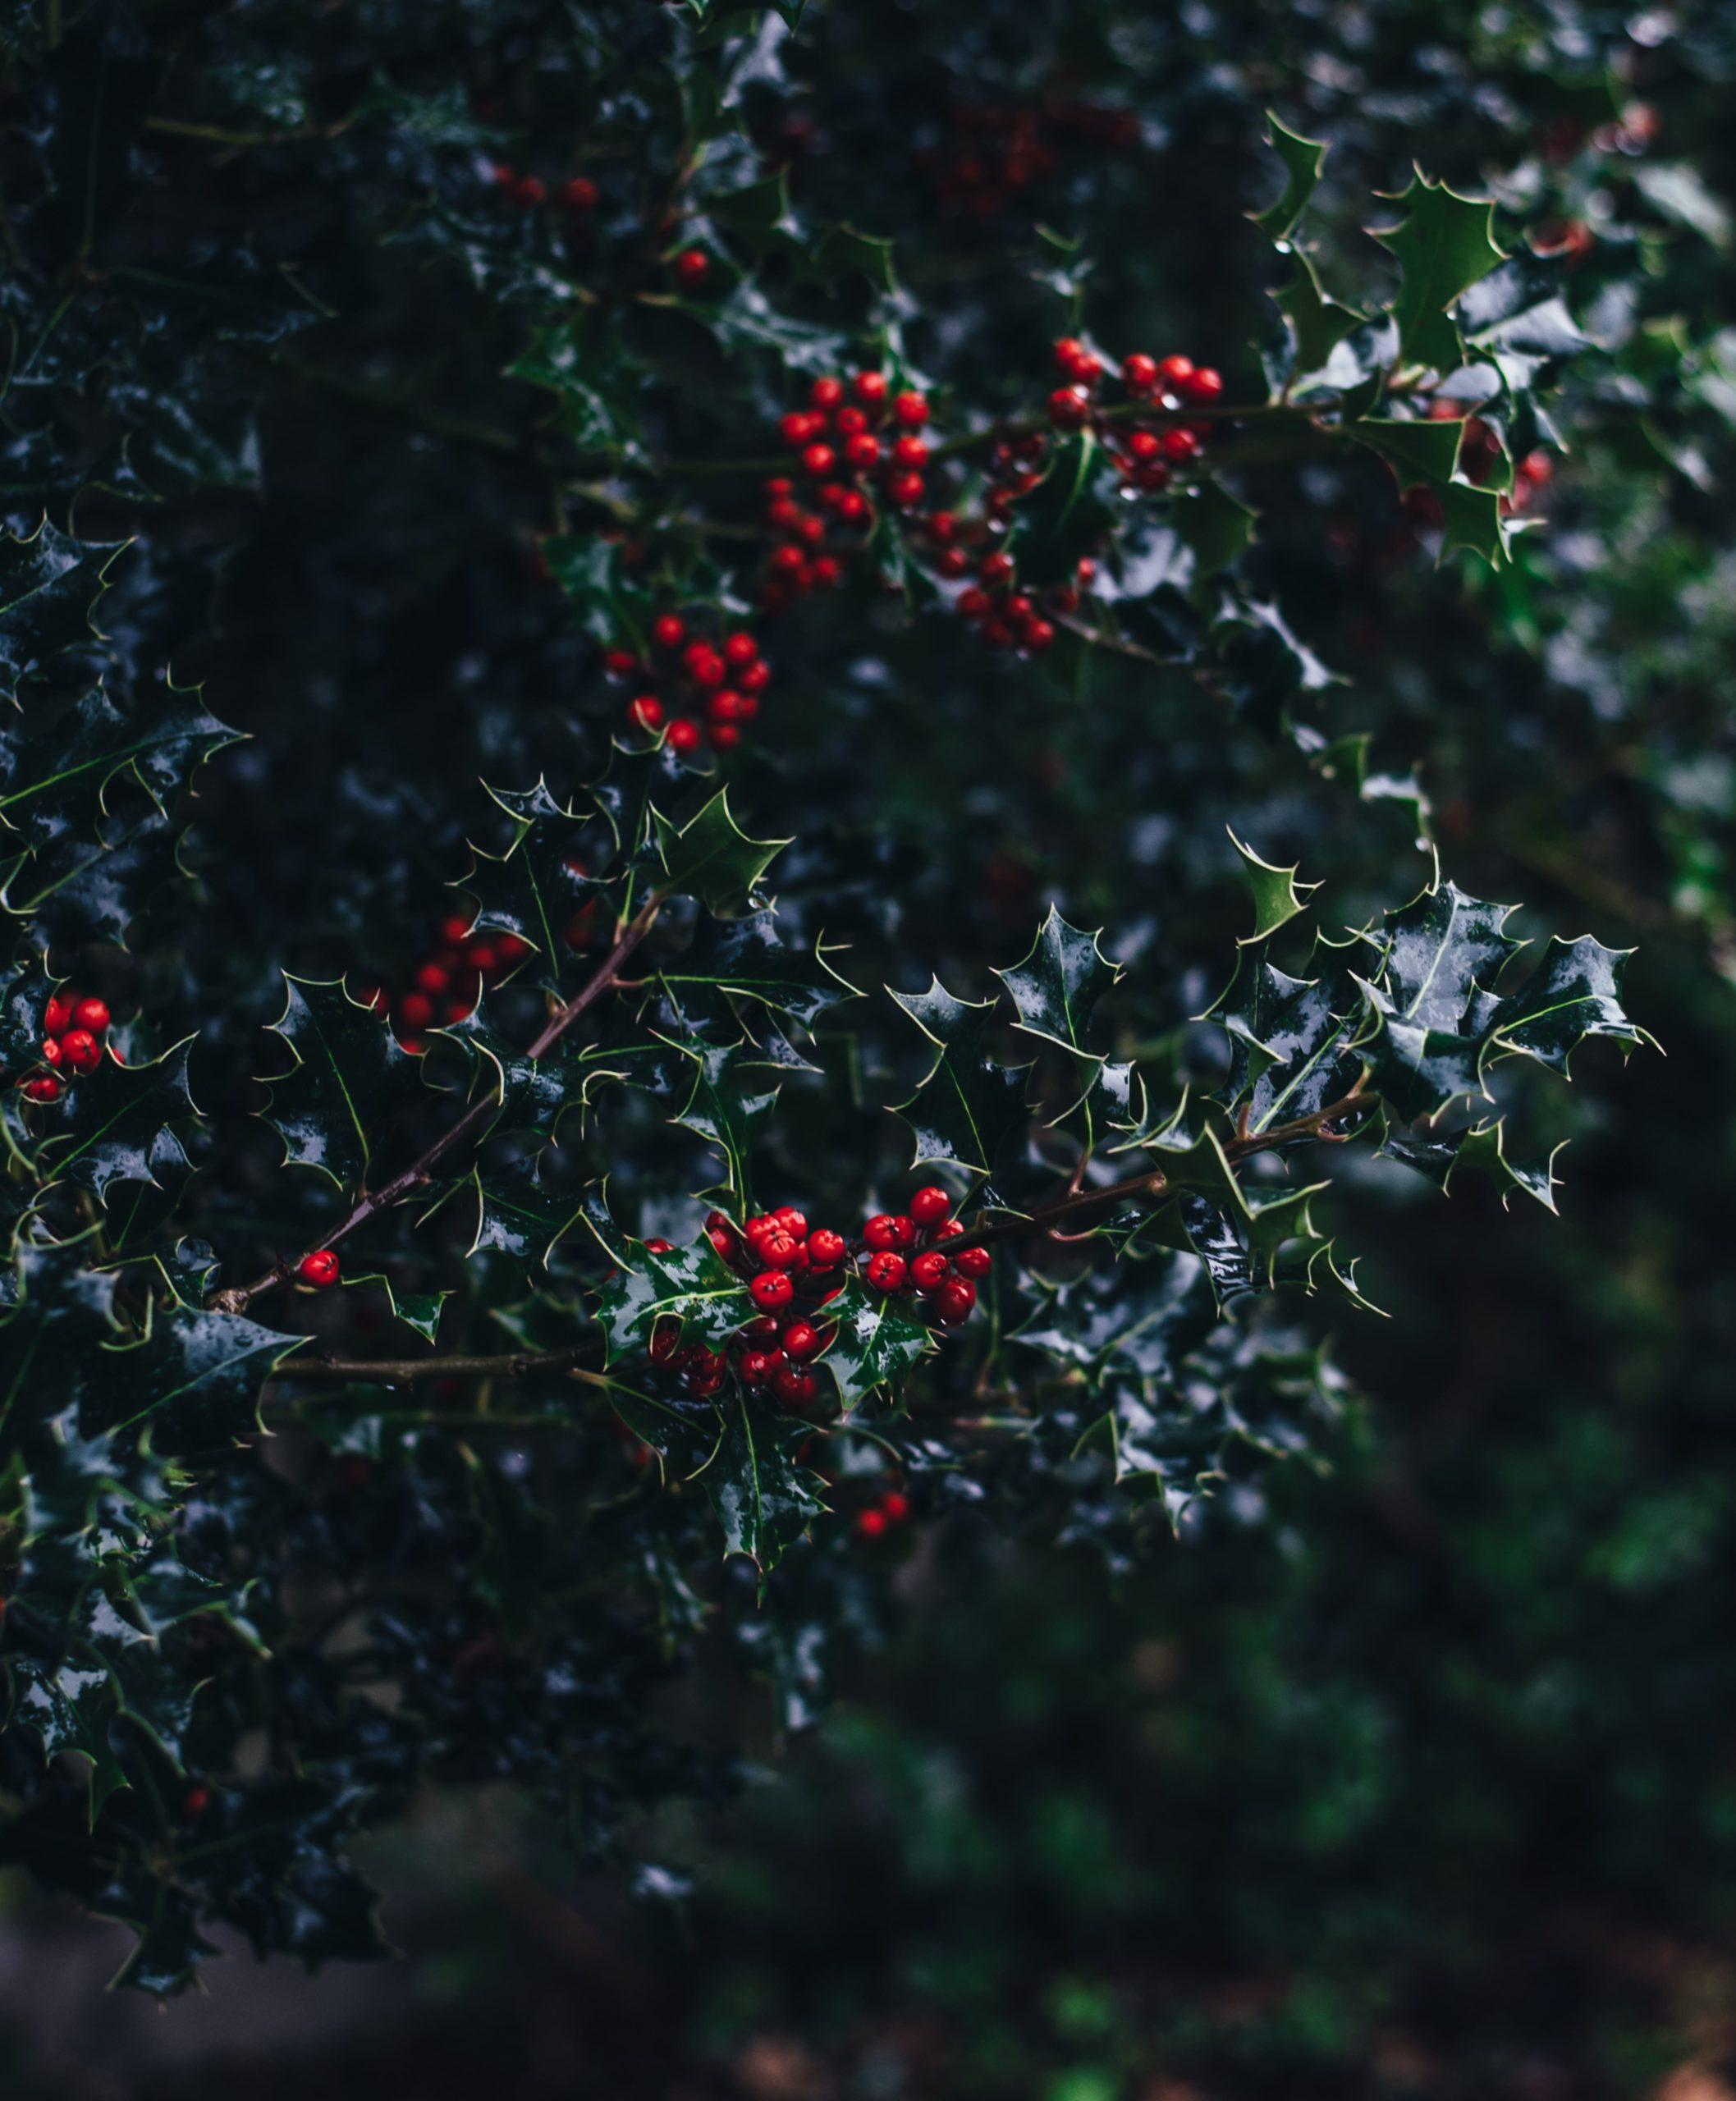 Reimagining Christmas